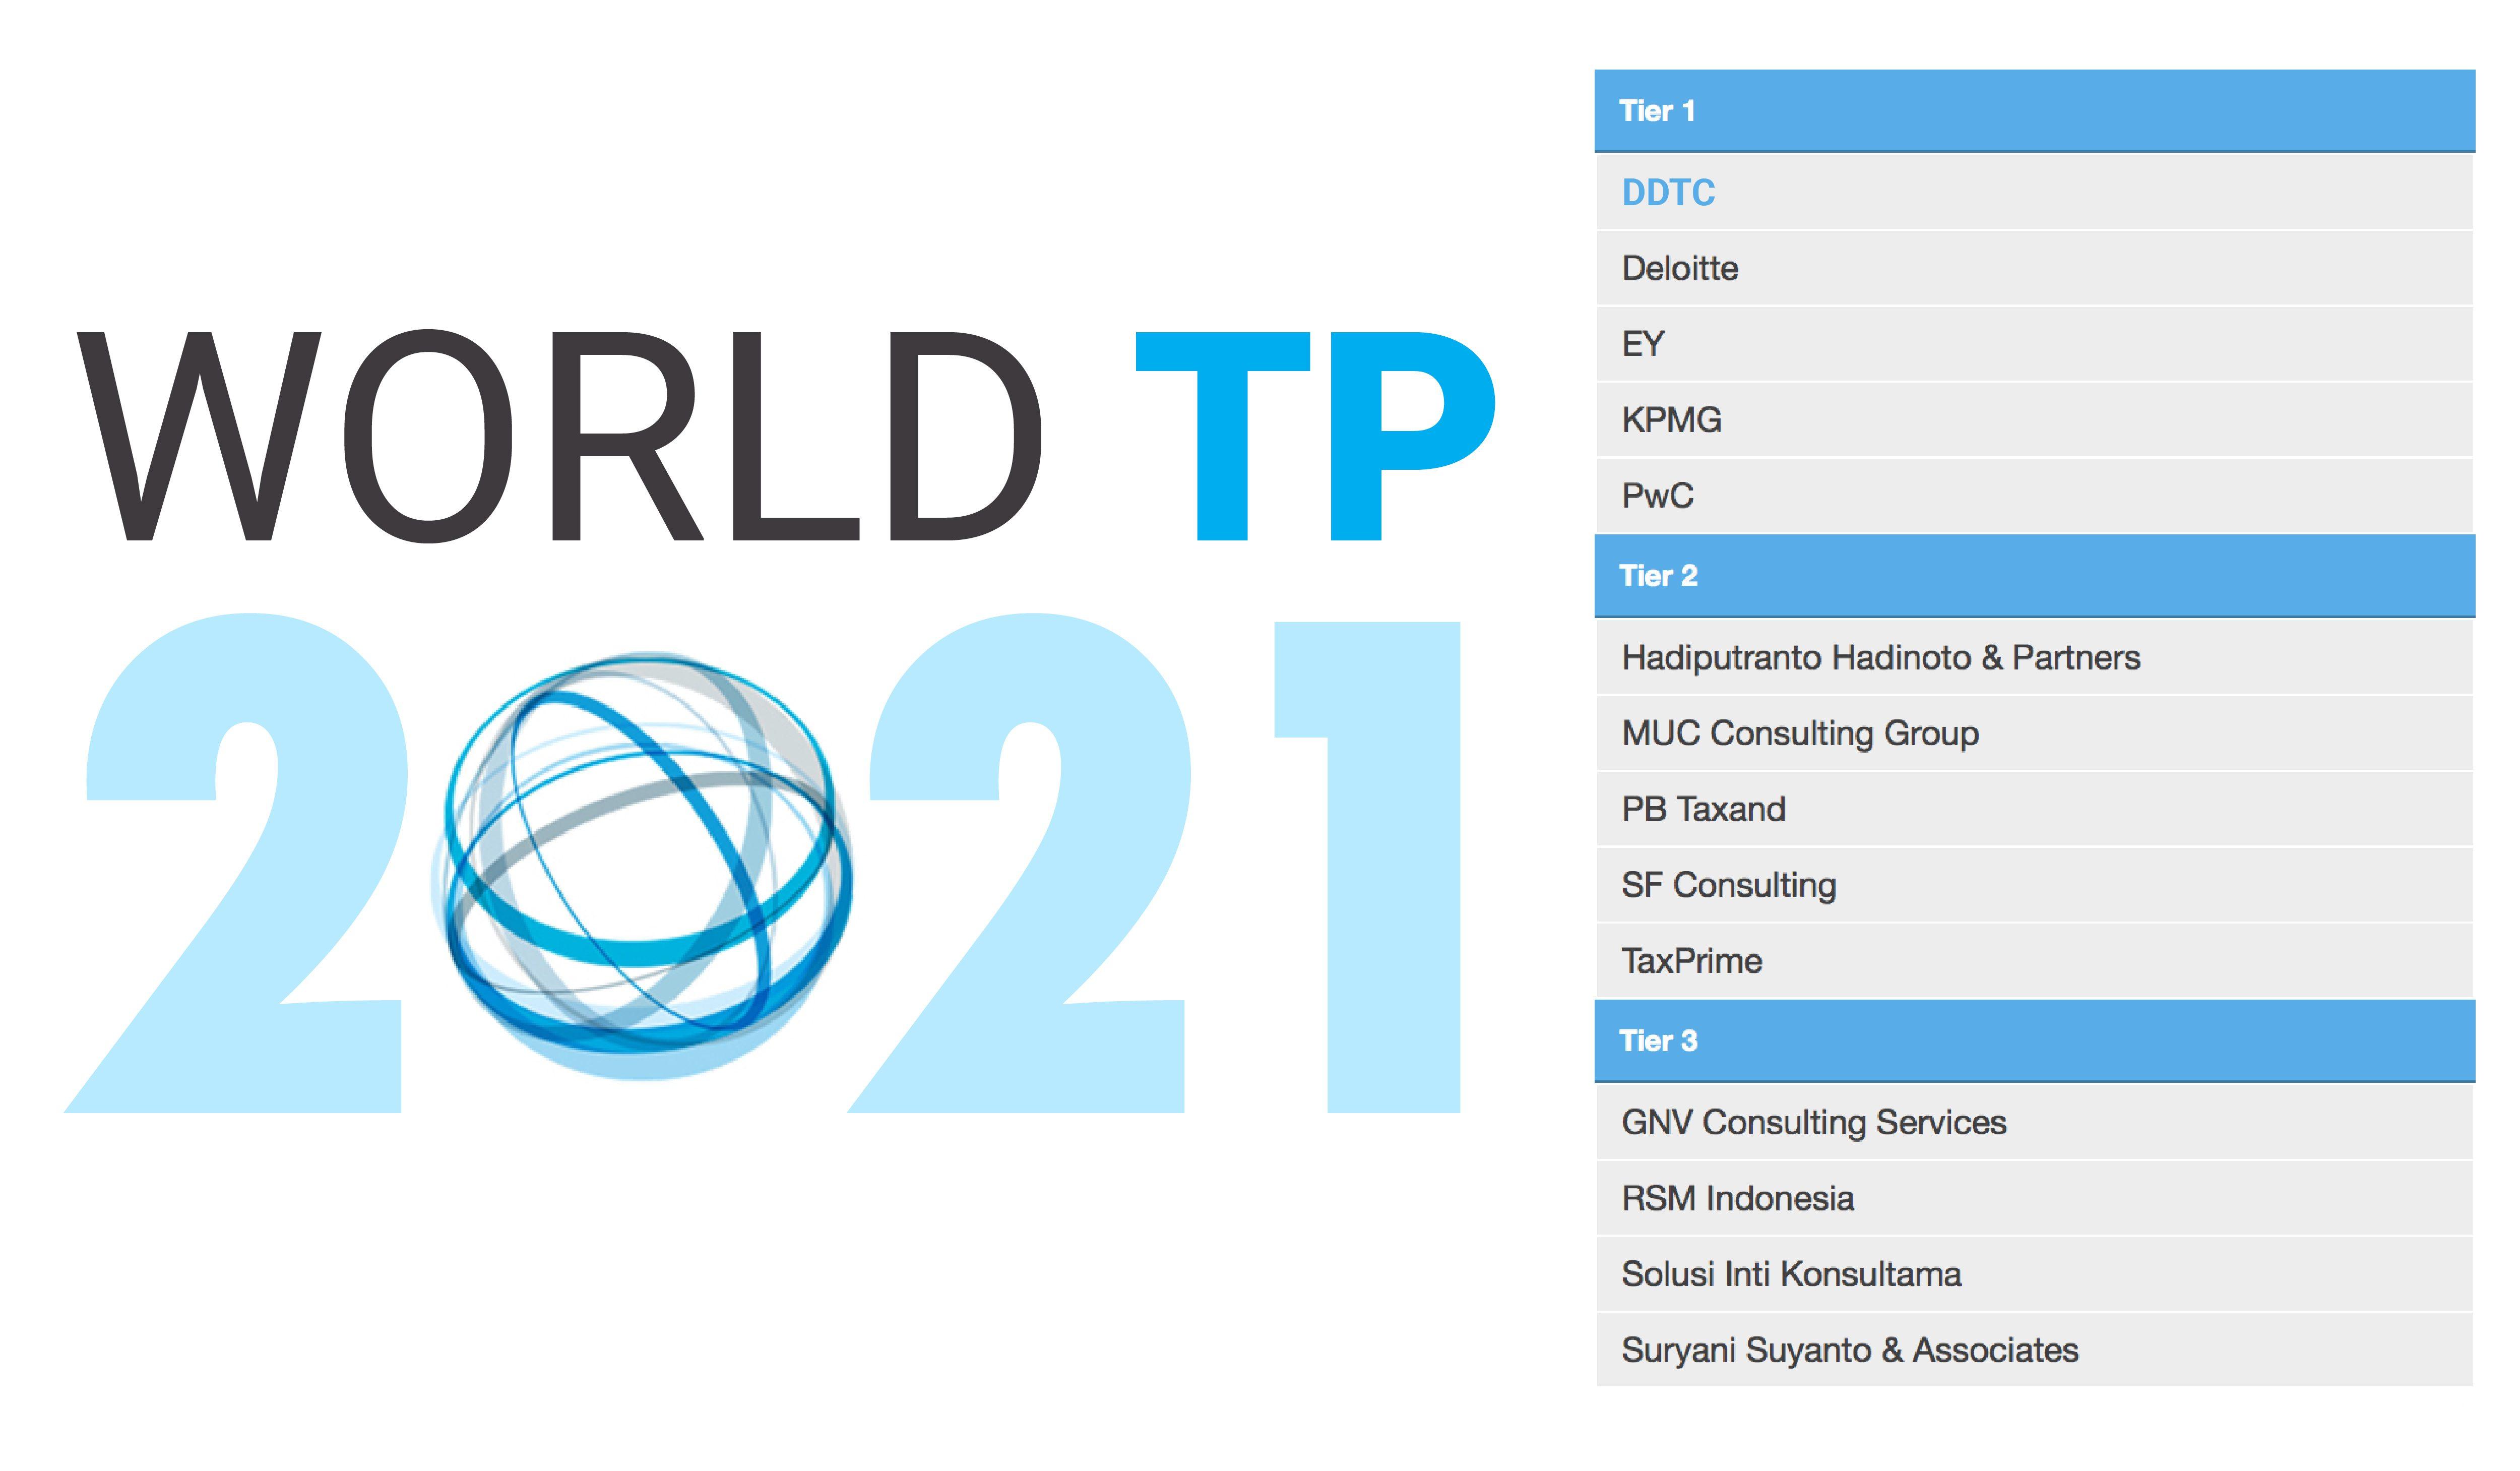 Rankings (World TP 2021)